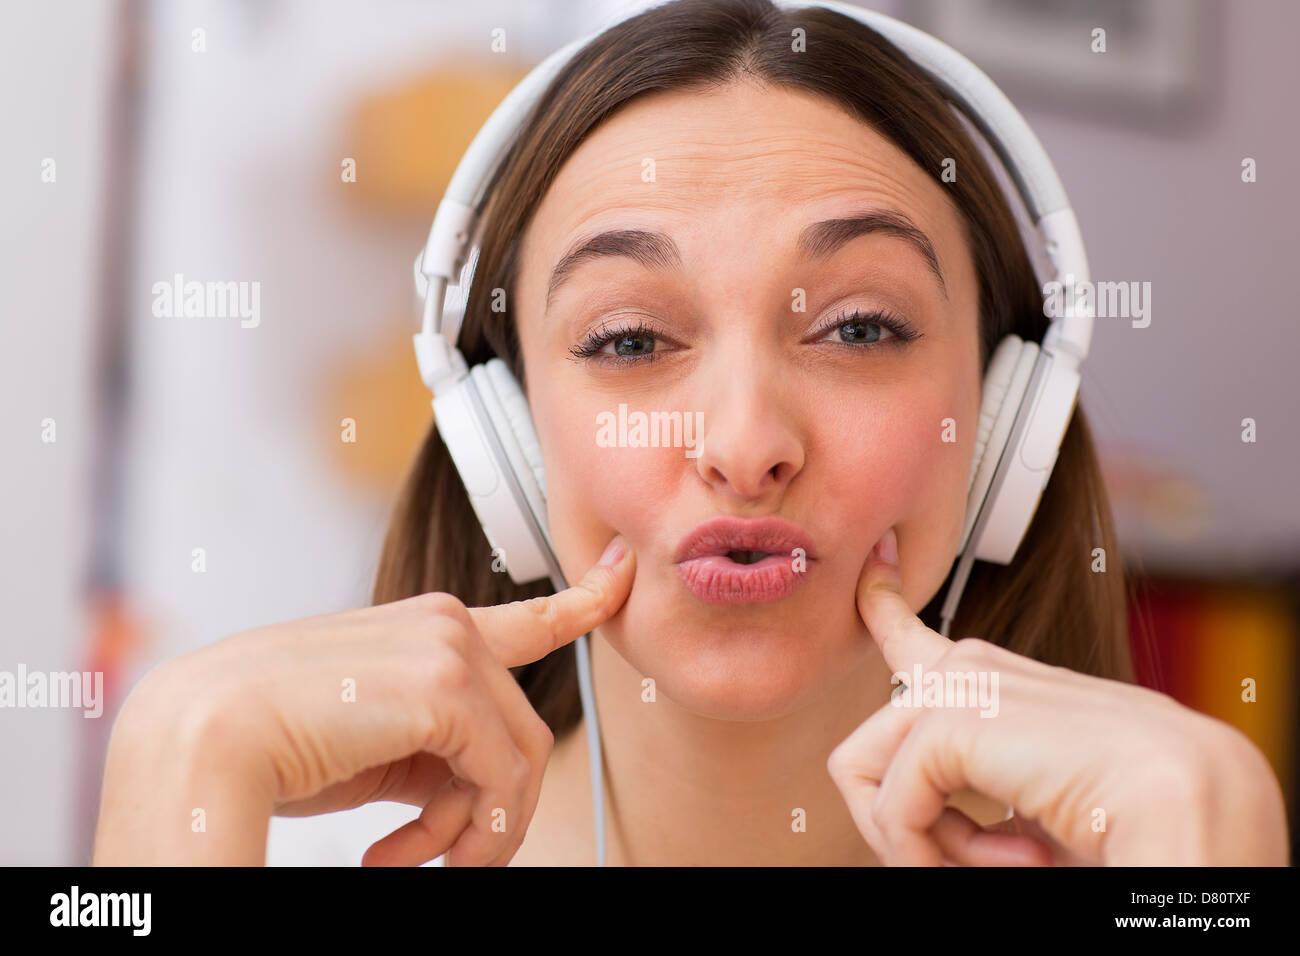 Attractive girl enjoying music through headphones, on sofa - Stock Image